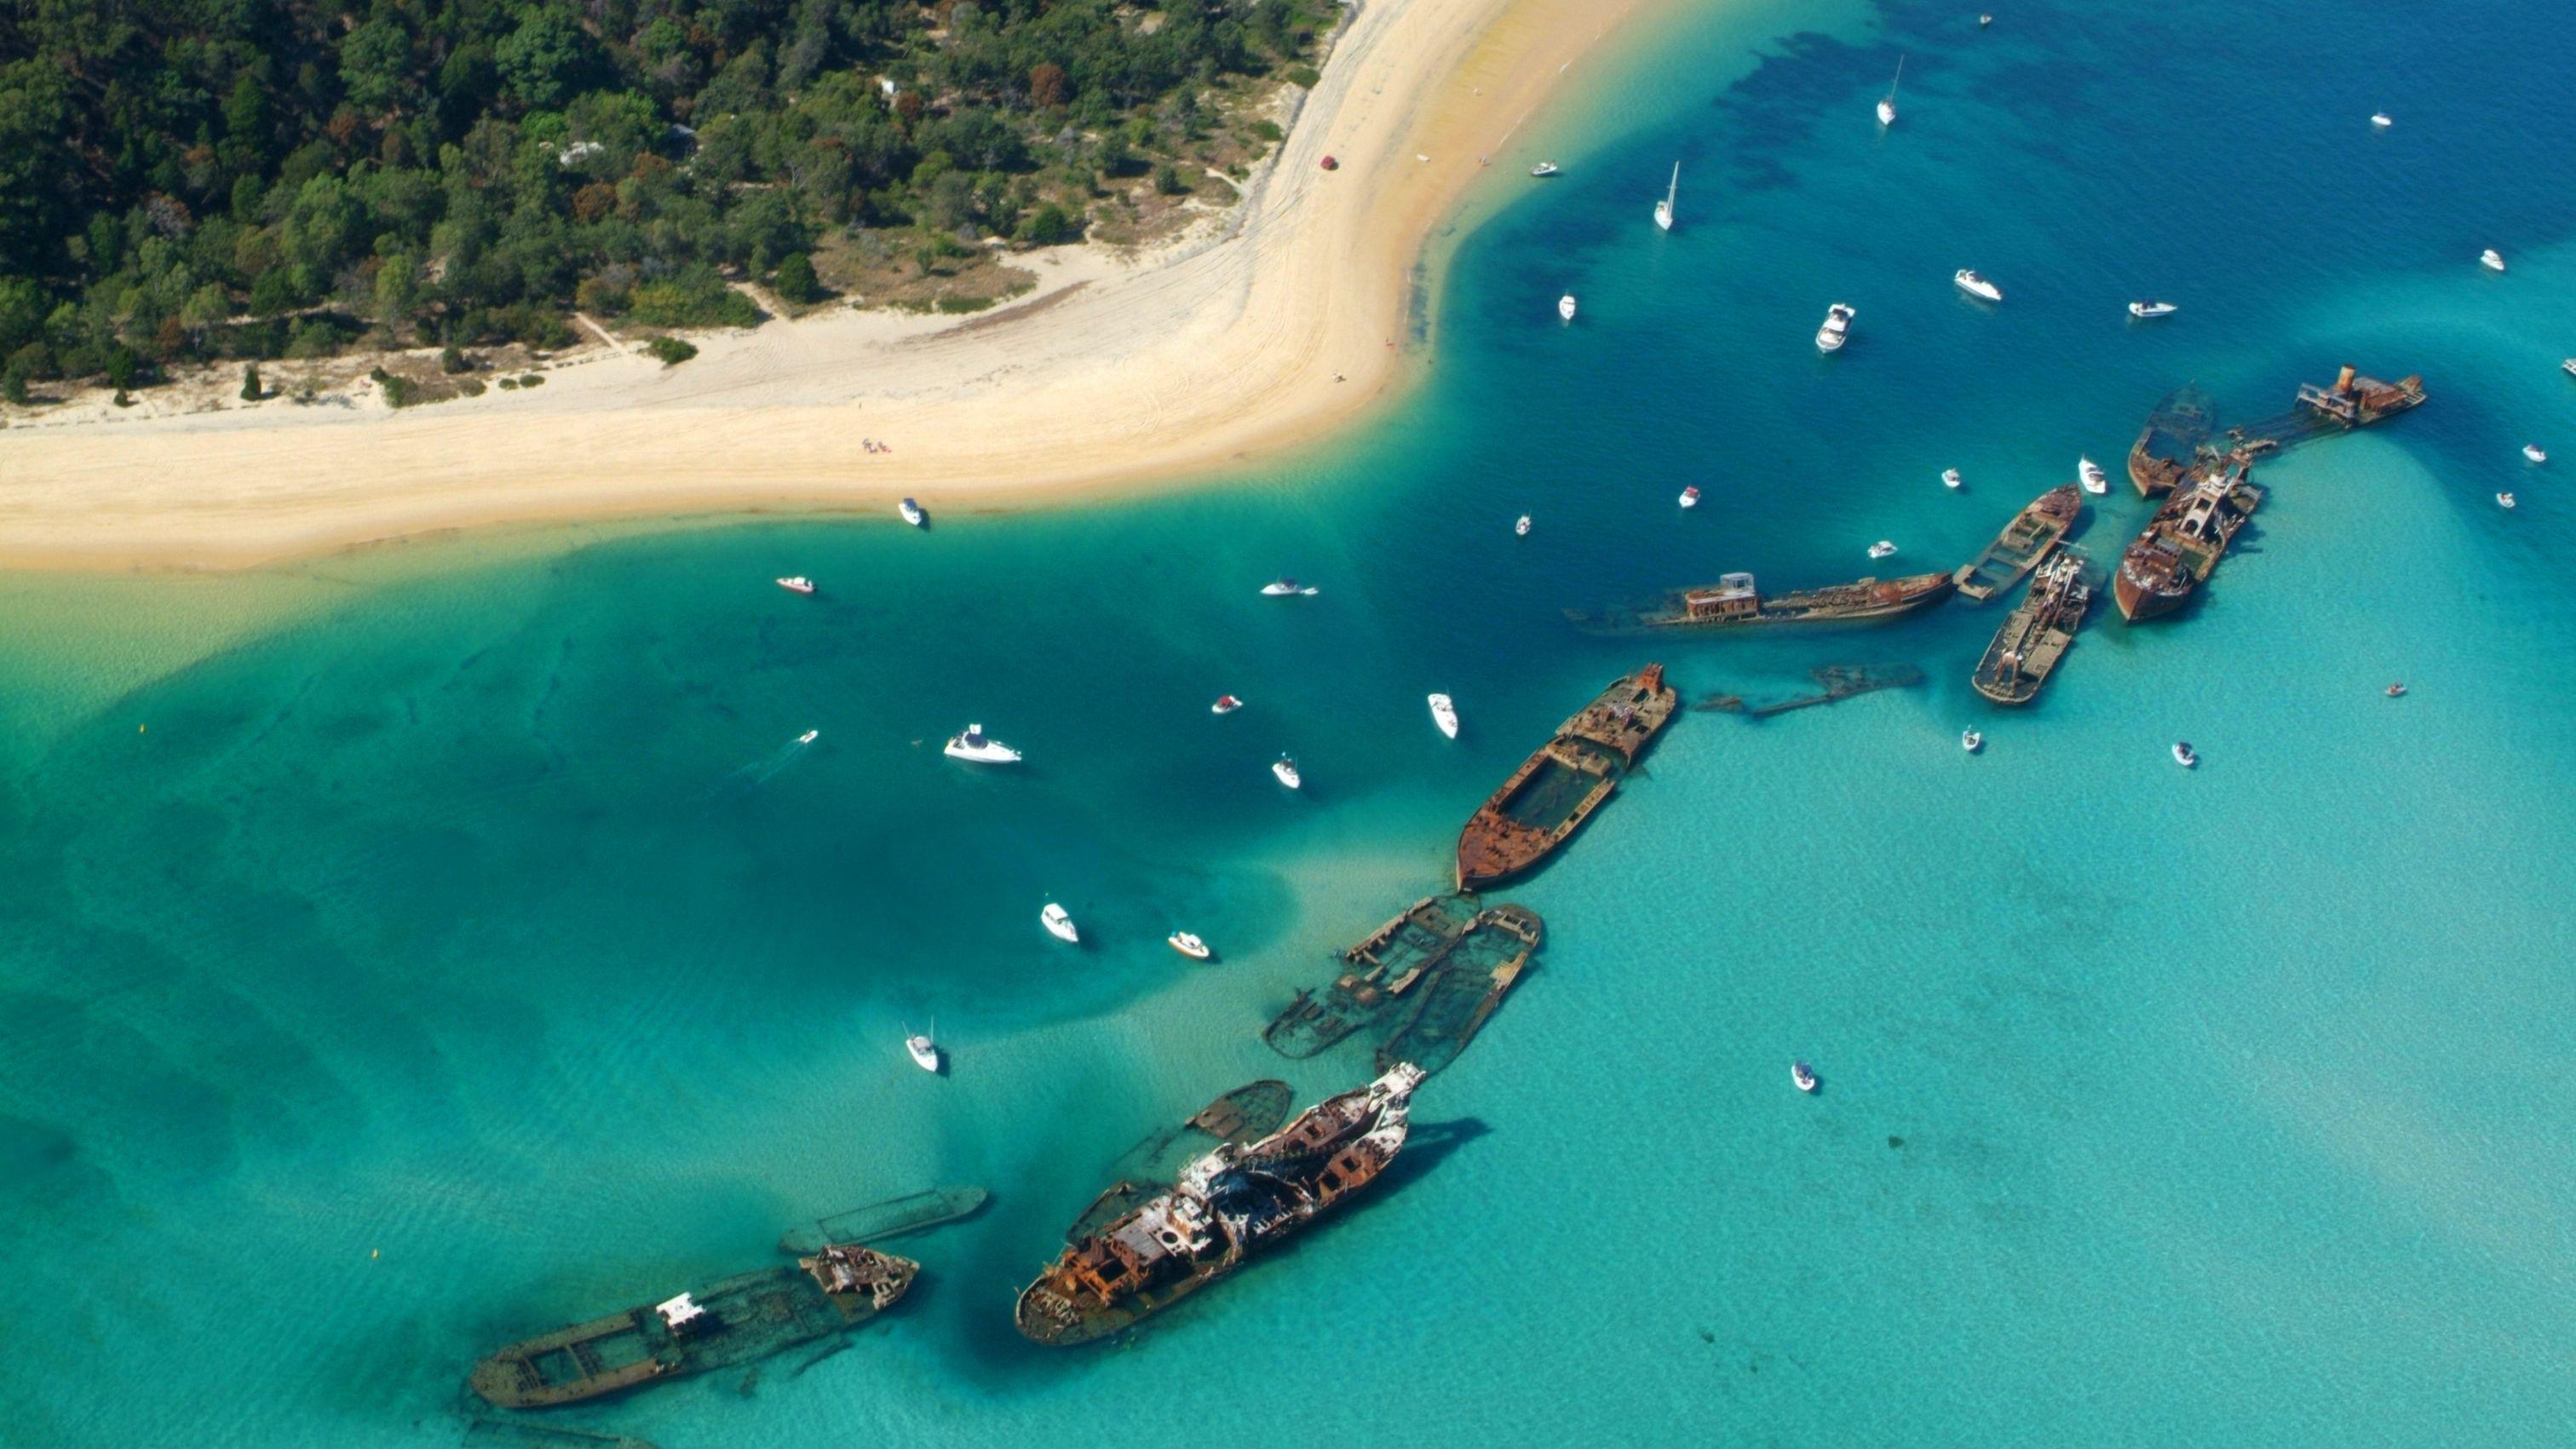 Aerial view of Tangalooma Island shipwrecks